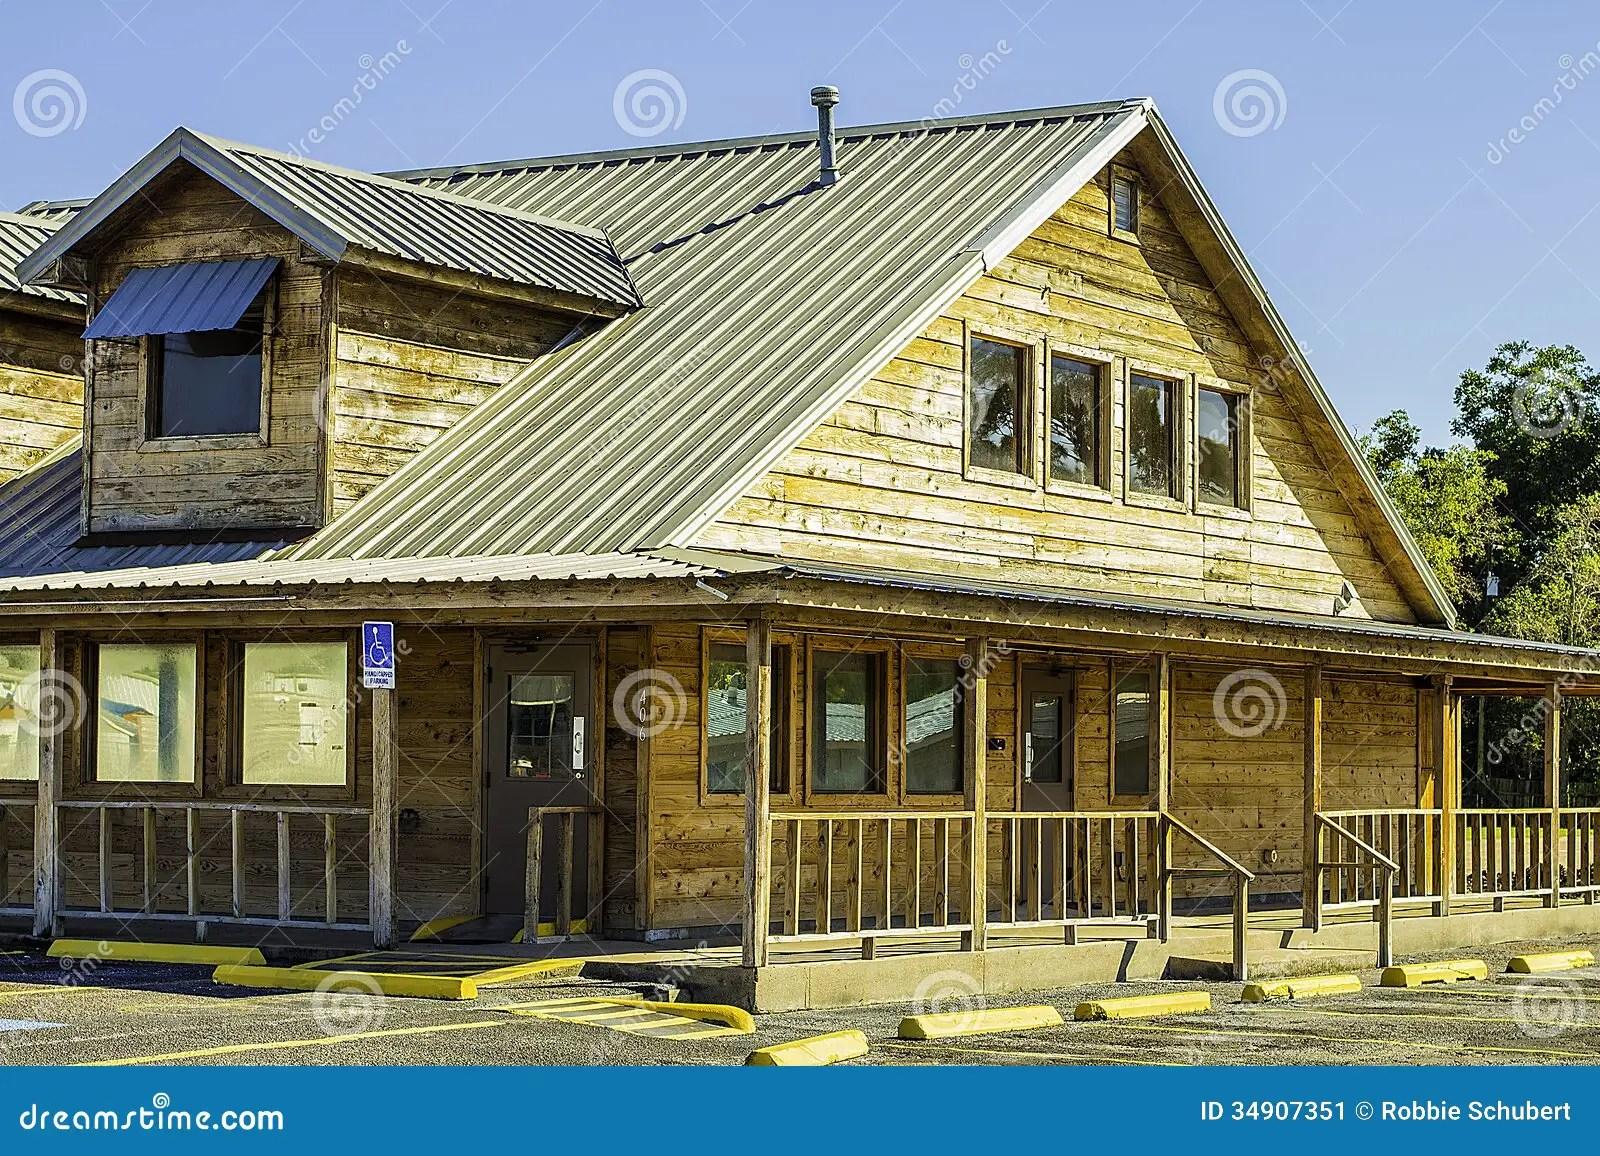 story southwestern house plans house design ideas southwestern home plans southwestern style home designs